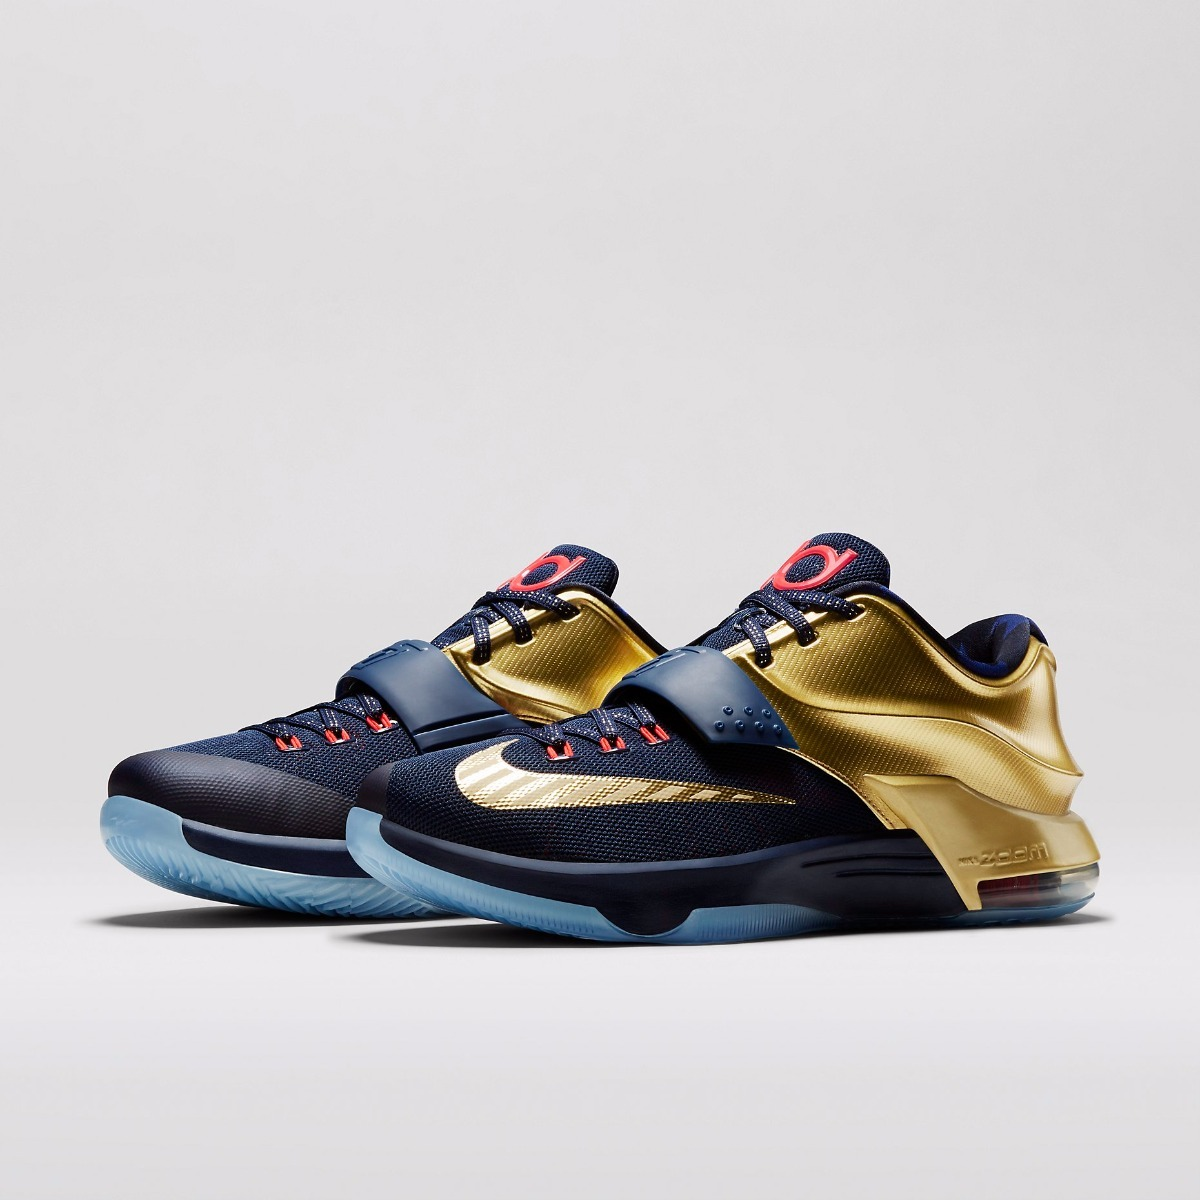 size 40 05d6c f4c56 Zapatillas Nike Kd 7 Vii Premium | Gold Medal 2017 Original